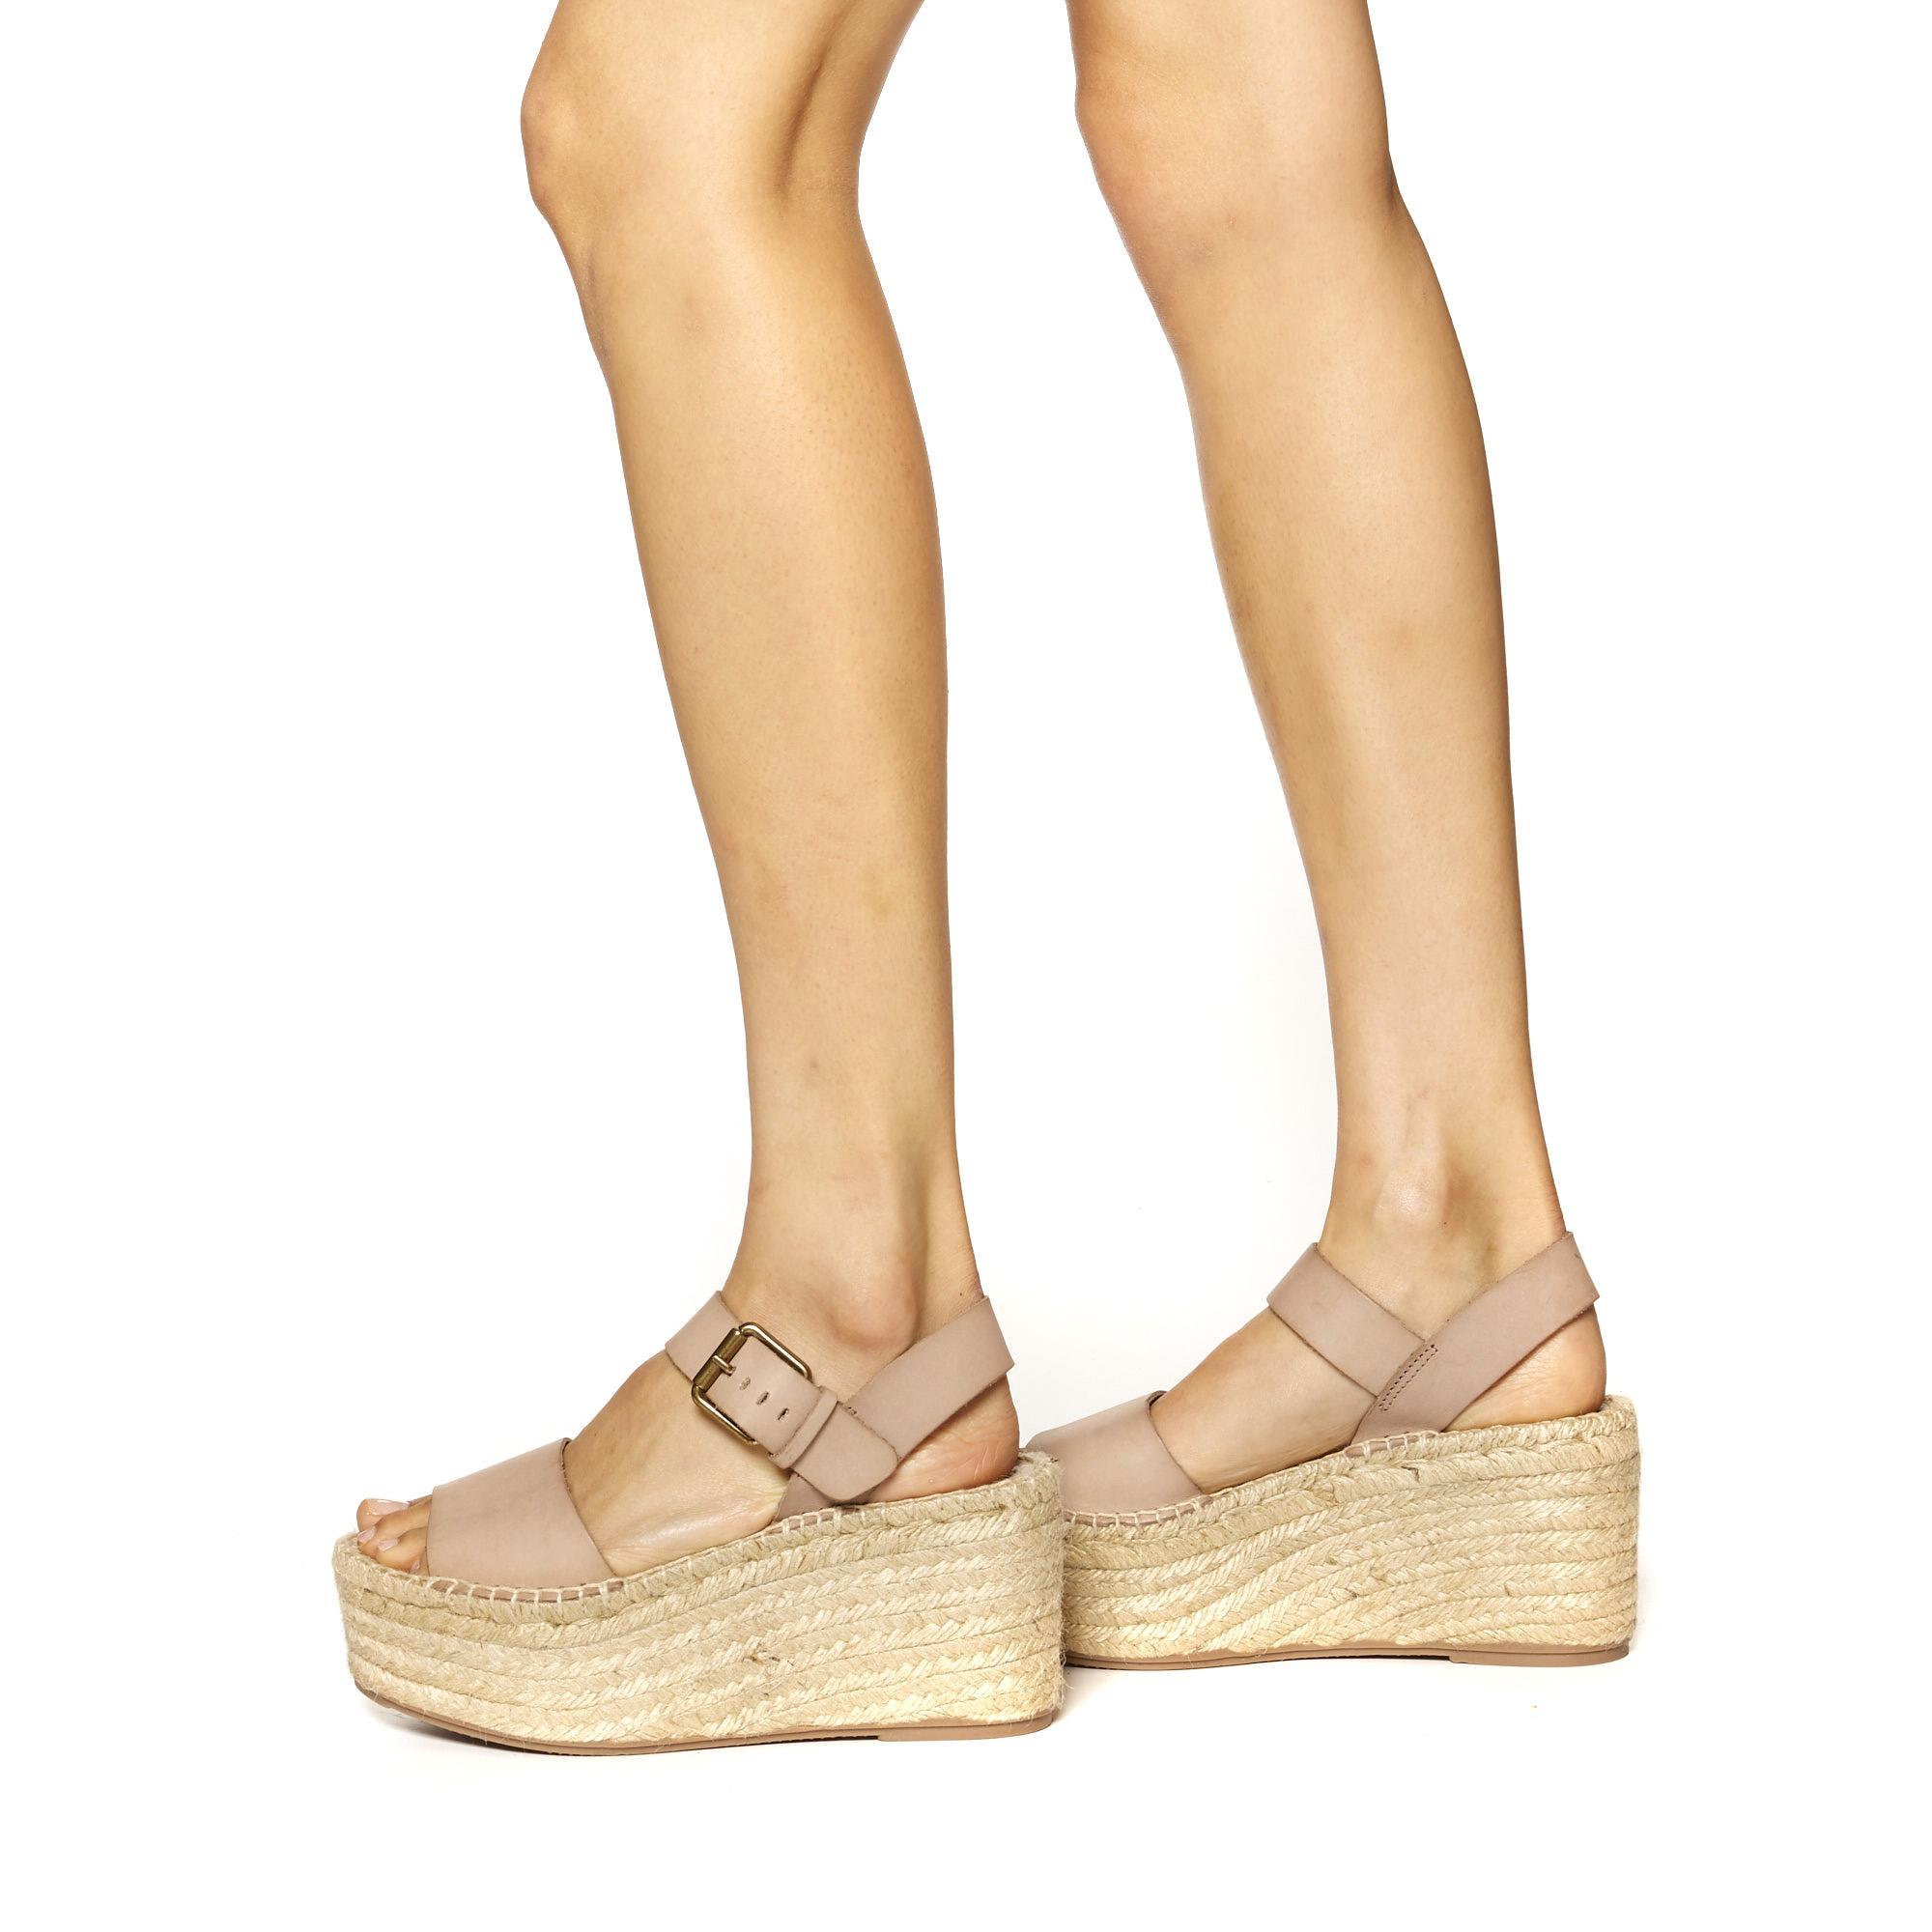 de24f8b6940 Lyst - Soludos Minorca High Platform Sandal